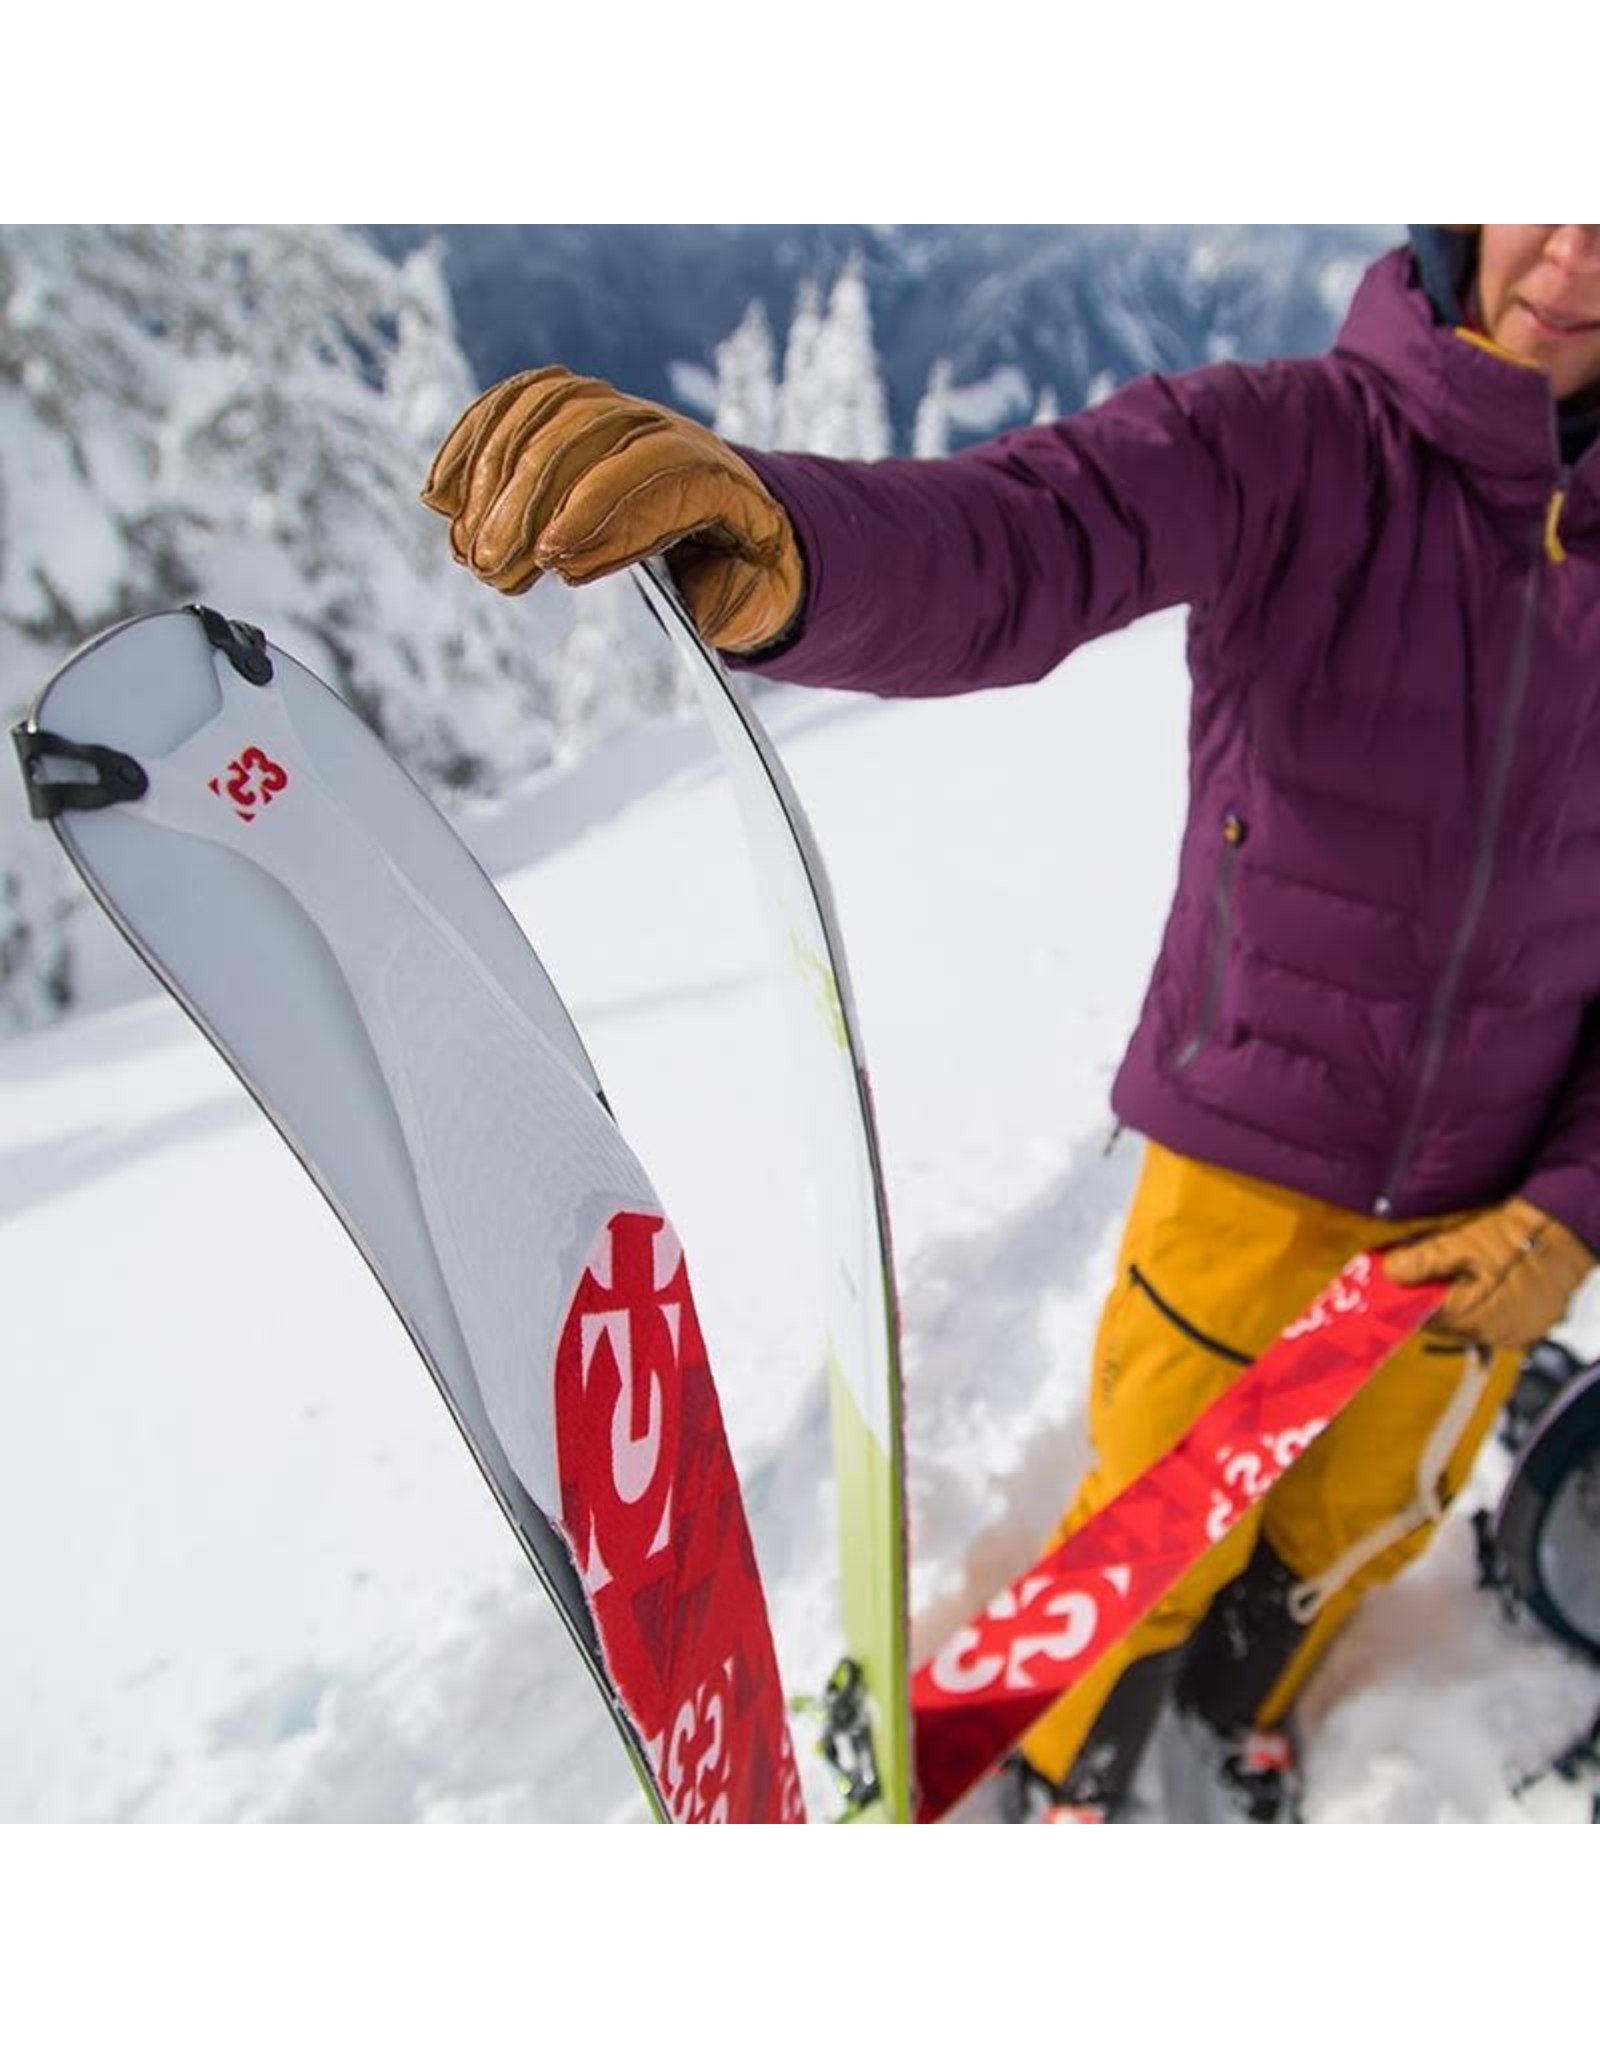 G3 G3 Alpinist+ 100mm Universal skins